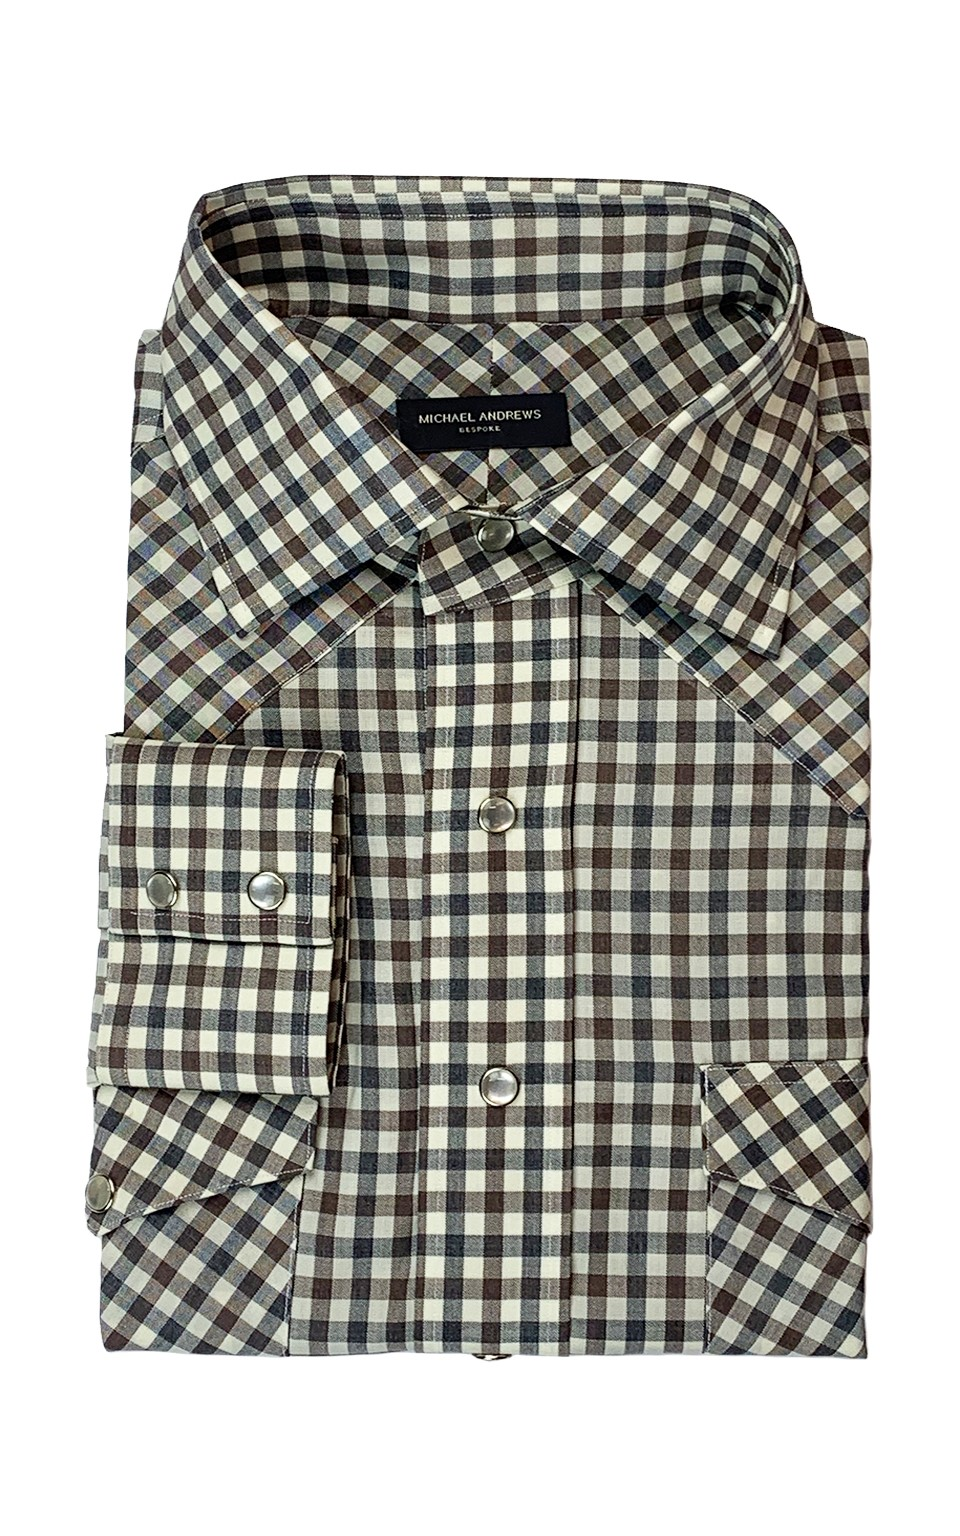 Grey/Brown Gingham Merino Wool Western Shirt